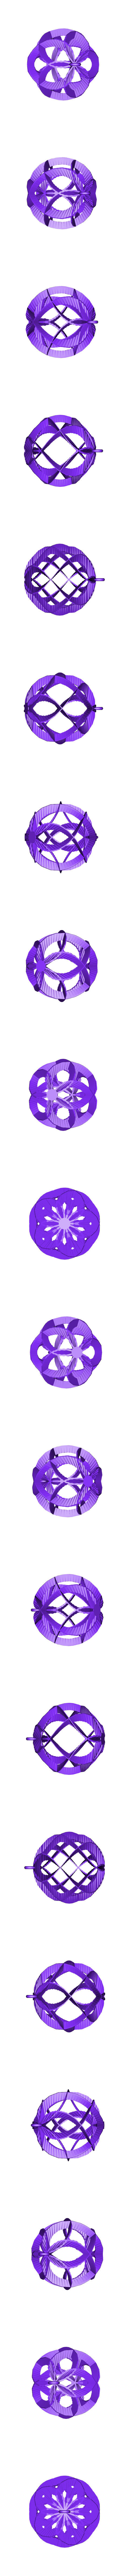 Spiral_sphere_ornament_2013-11-23.stl Download free STL file Spiral Sphere Ornament - Customizer enabled • 3D printing design, Girthnath